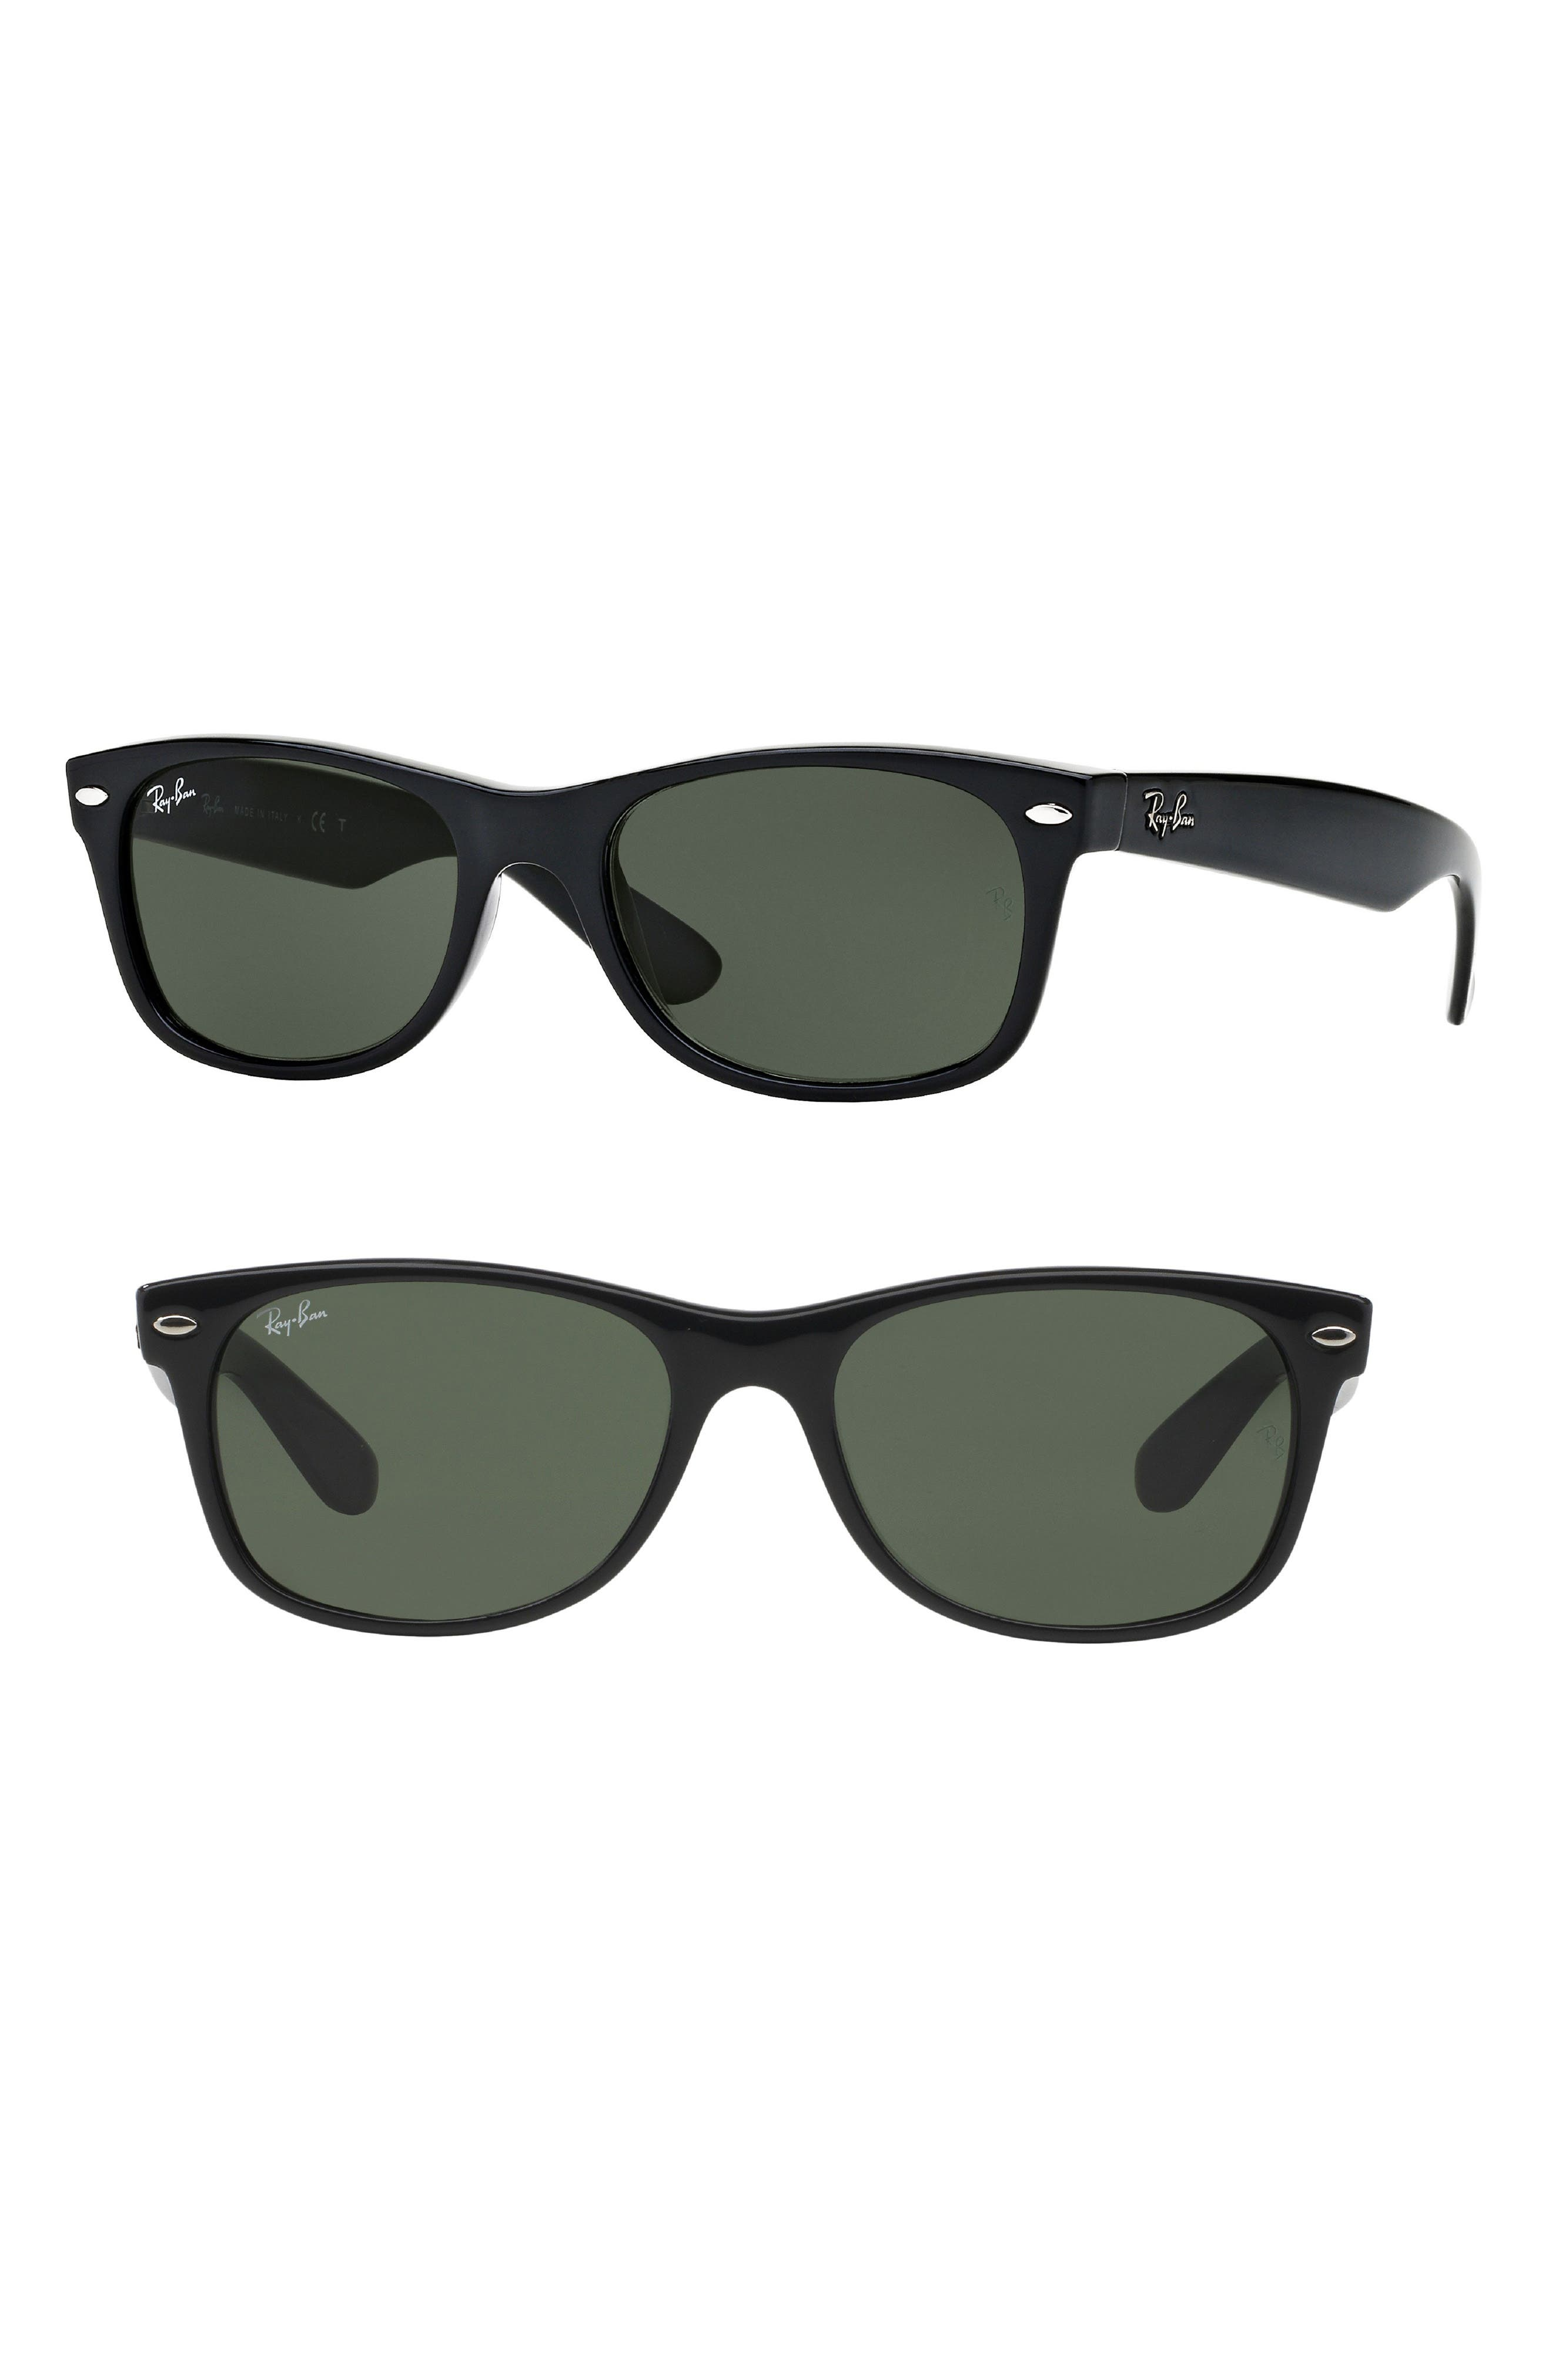 Ray-Ban Standard New Wayfarer 55Mm Sunglasses -